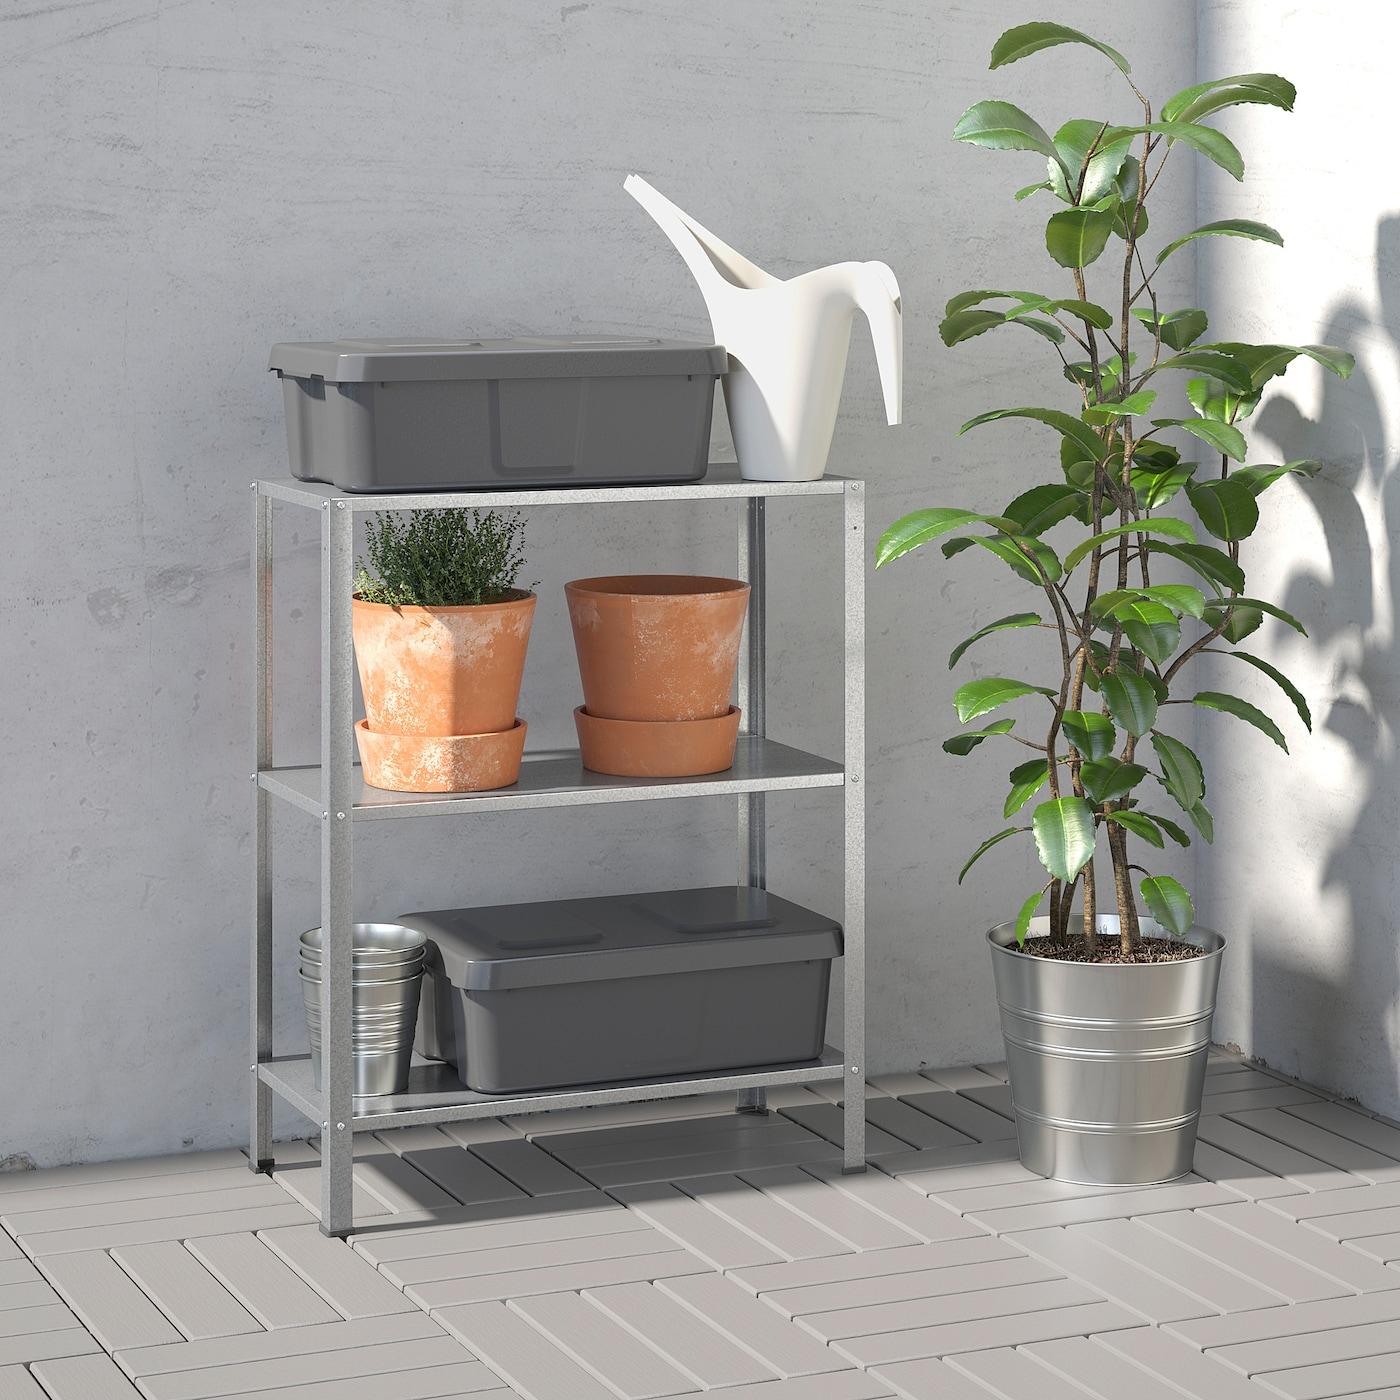 Hyllis Shelf Unit Indoor Outdoor 23 5 8x10 5 8x29 1 8 Ikea